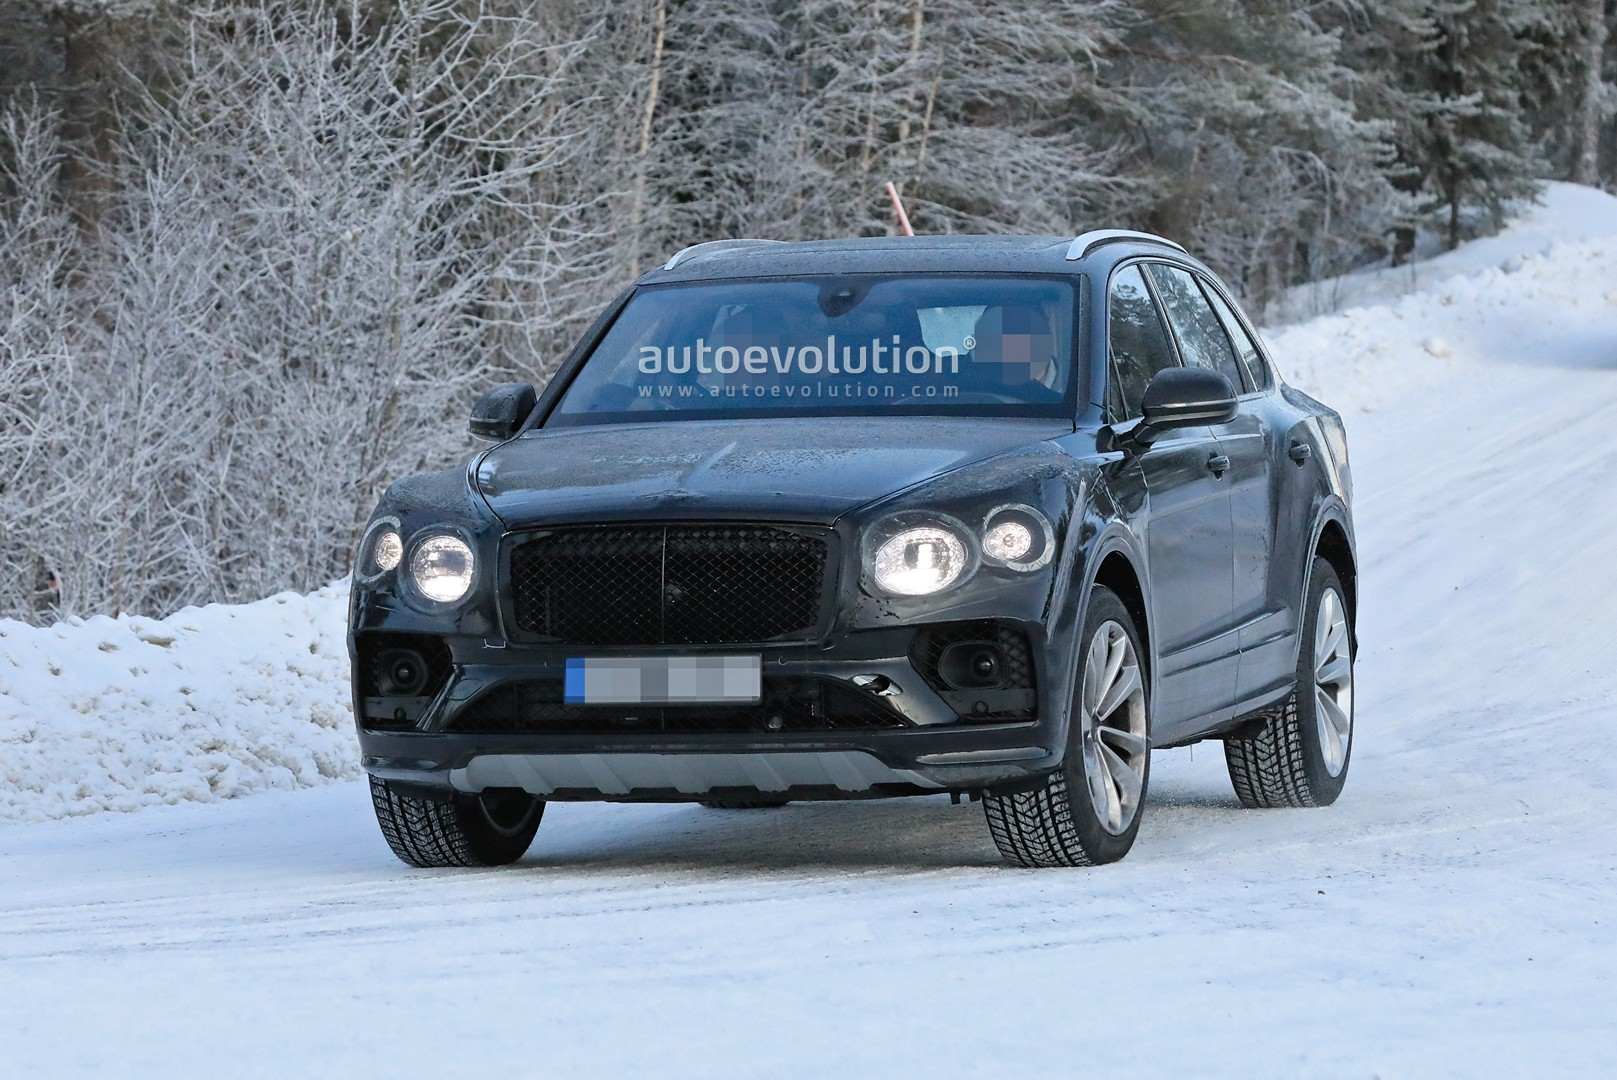 2021 Bentley Bentayga Facelift Makes Spy Photo Debut Autoevolution